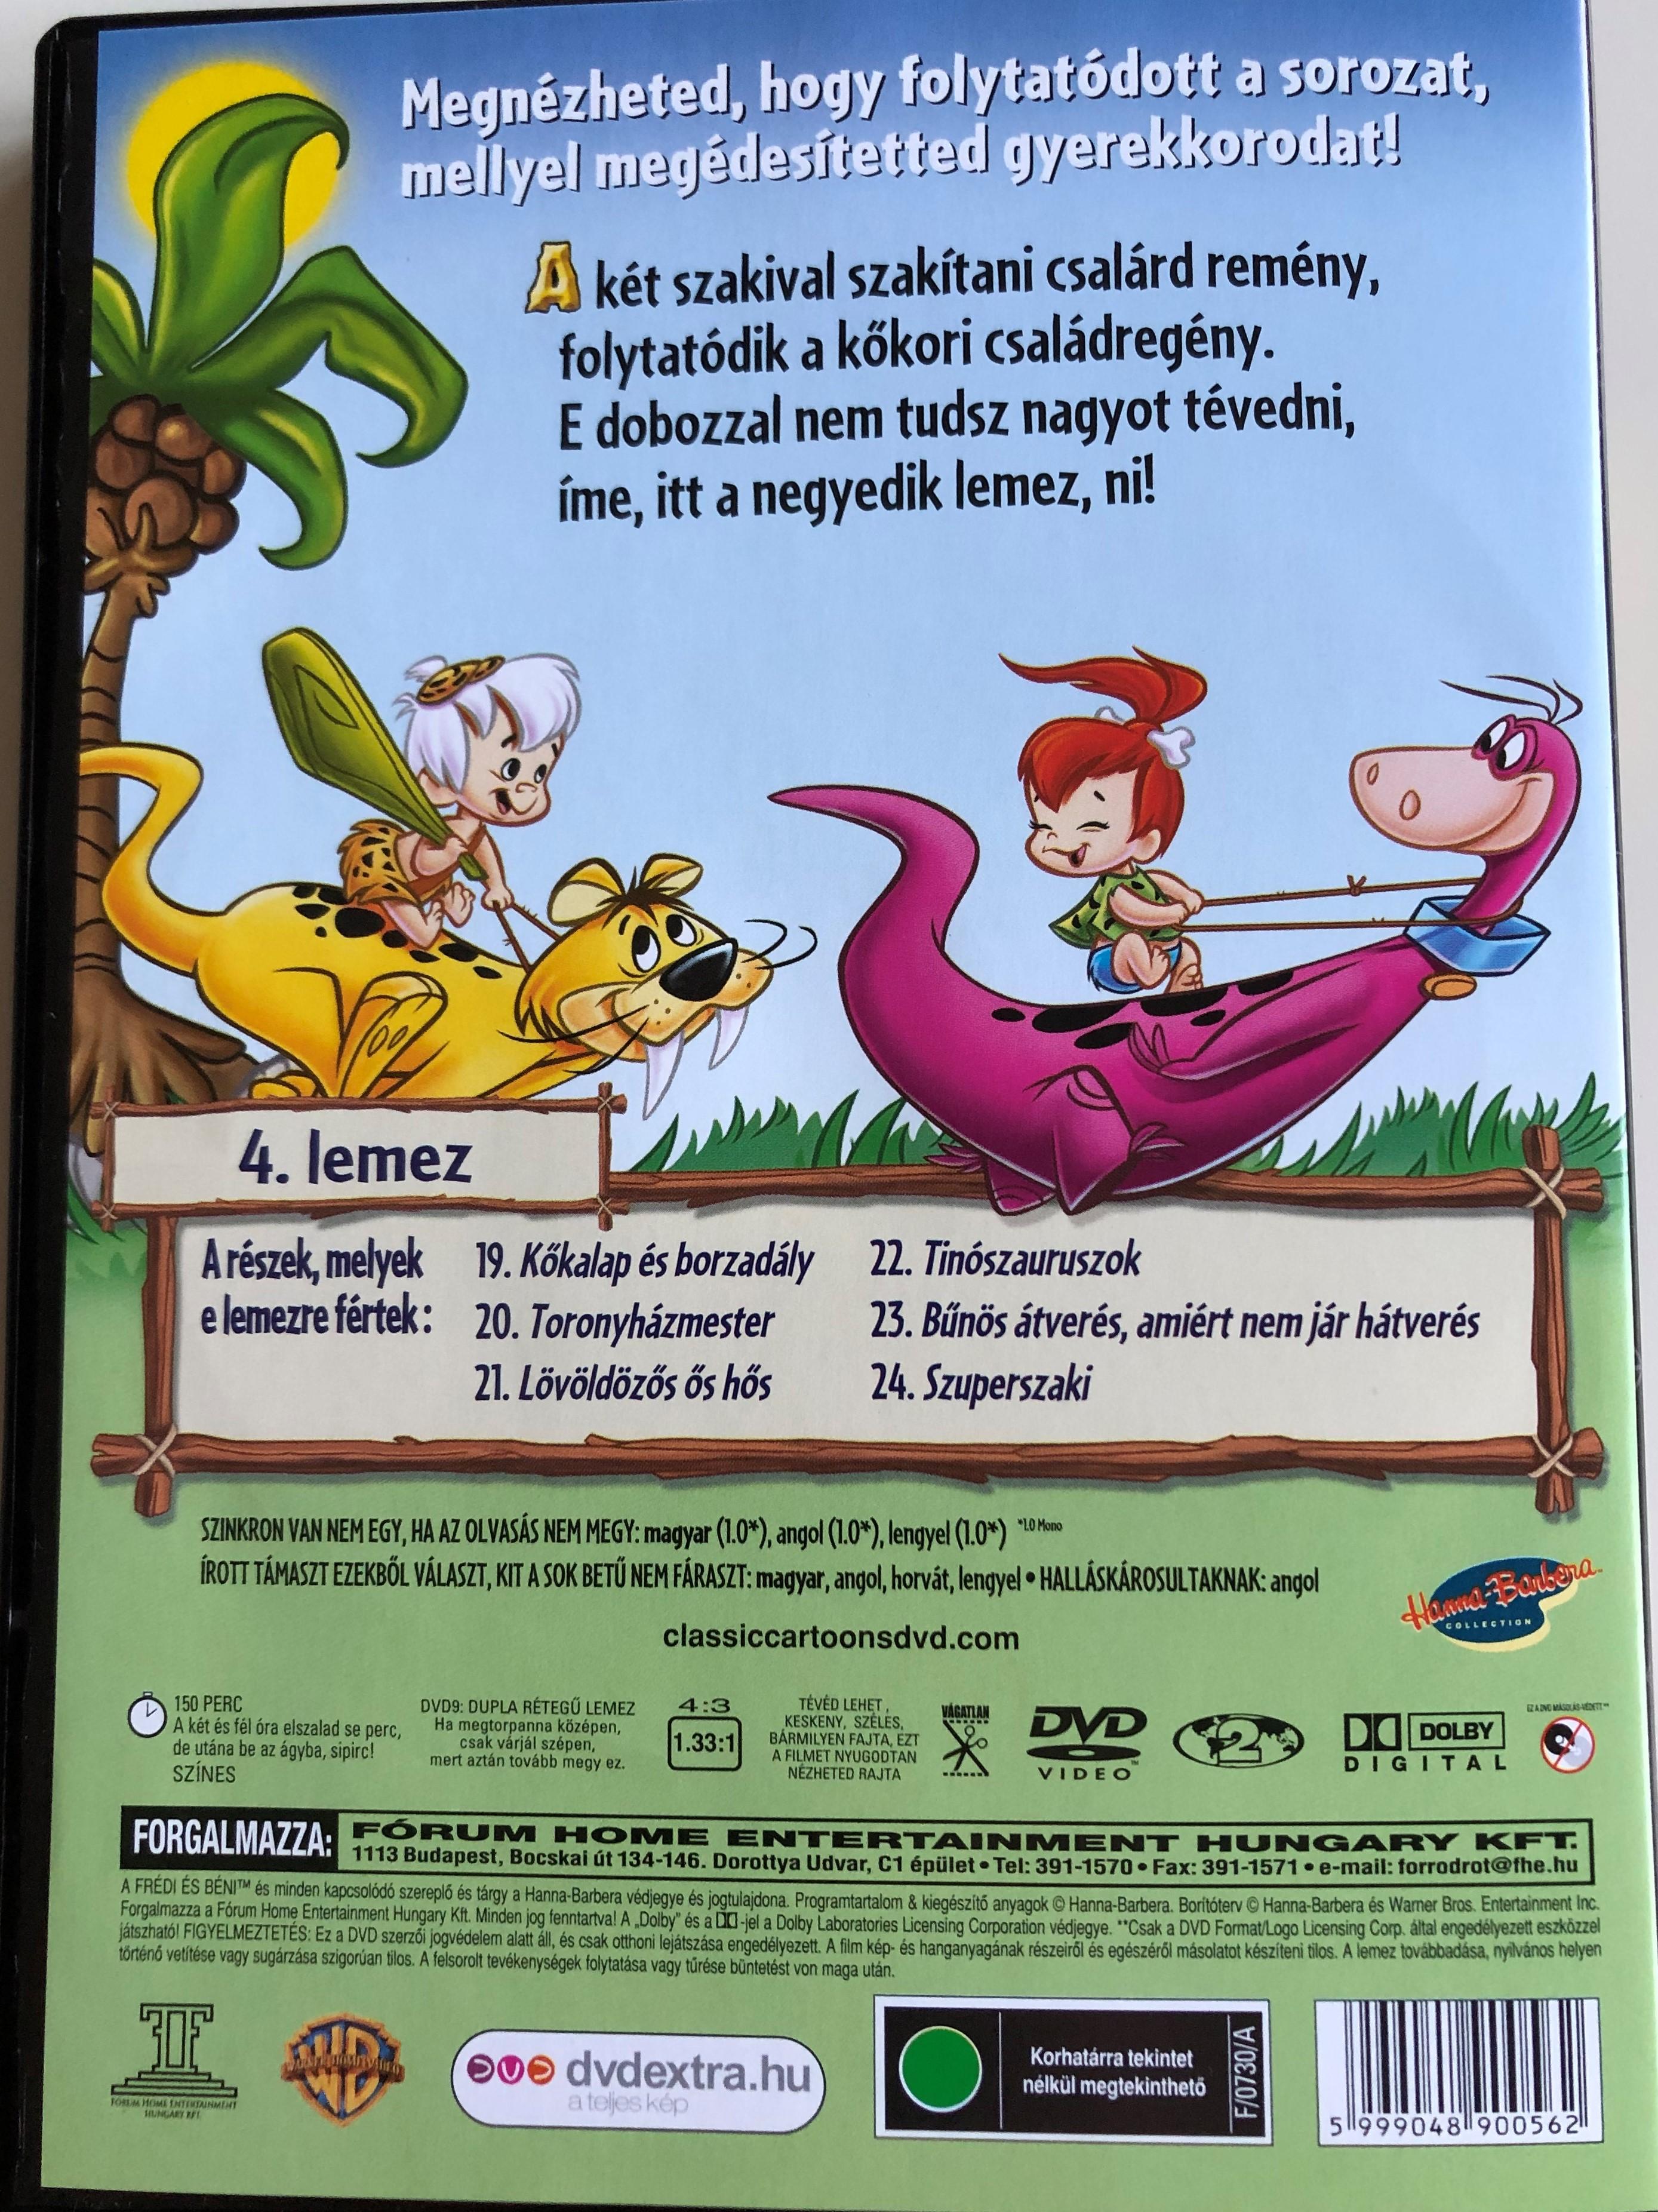 the-flintstones-series-dvd-1966-fr-di-s-b-ni-a-k-t-k-korszaki-szaki-season-5-t-dik-vad-episodes-19-24-disc-4-hanna-barbera-animated-classic-2-.jpg